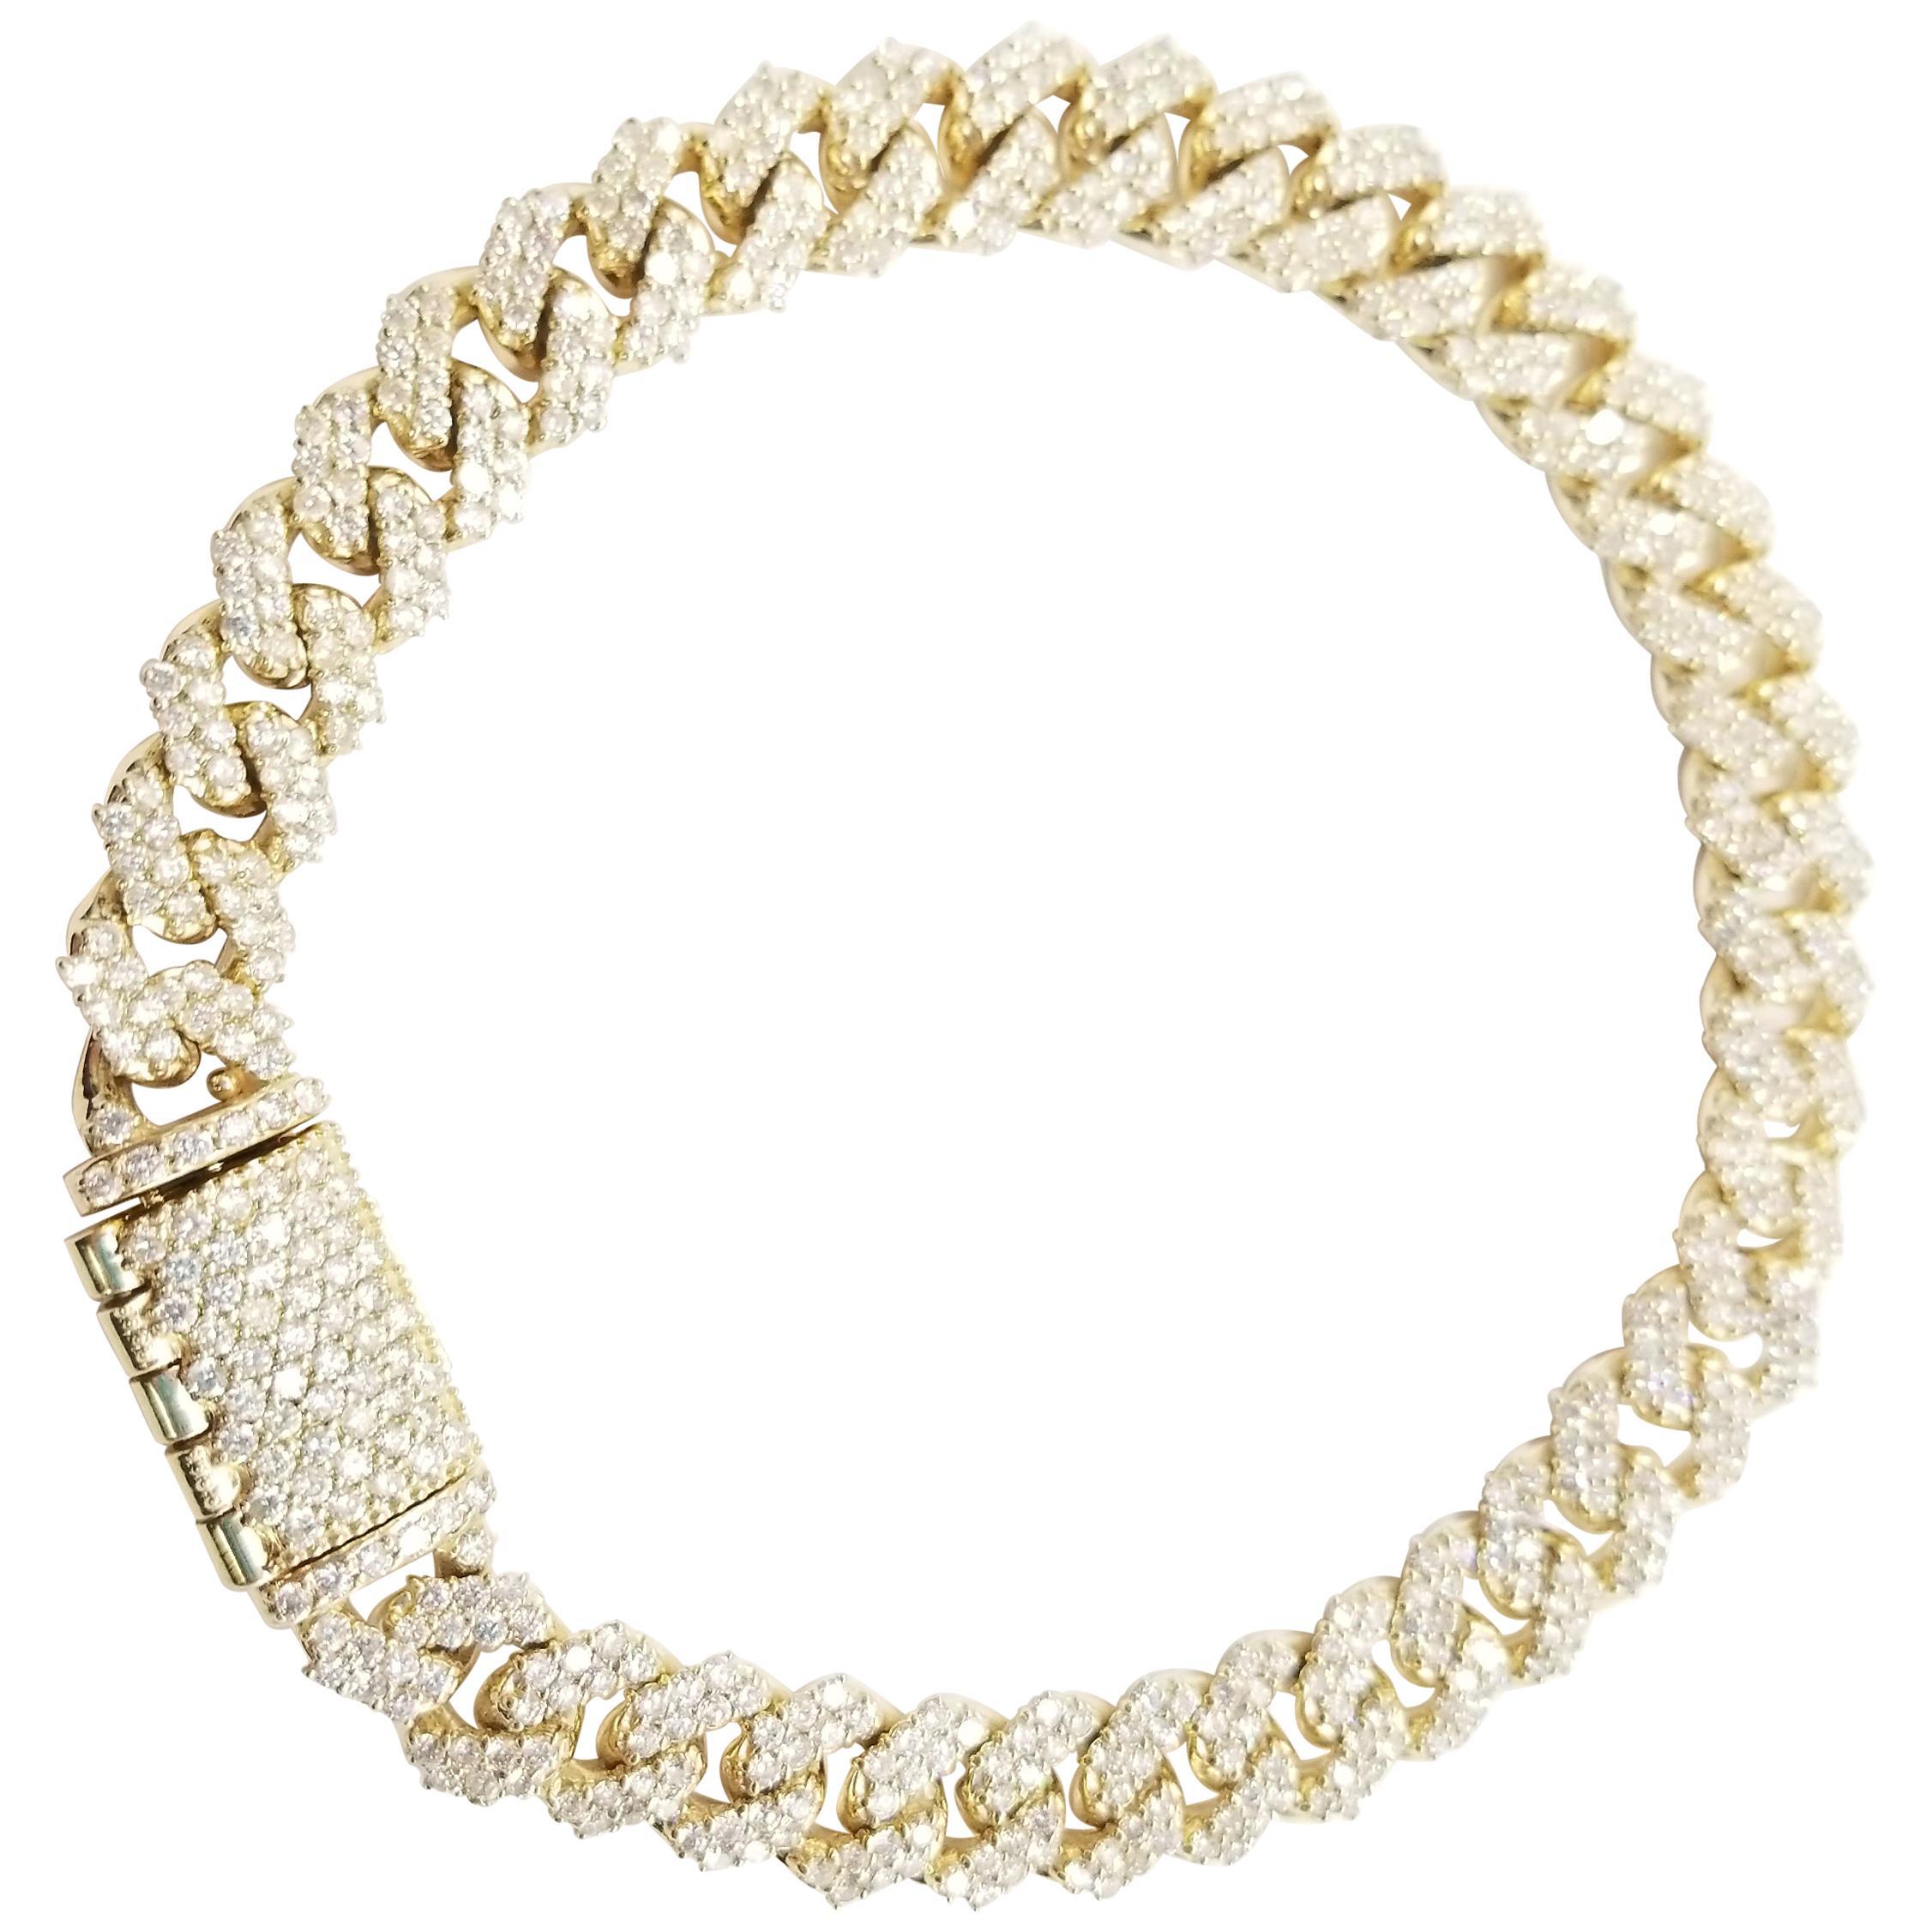 6.82 Carat Diamond Men's Cuban Link Chain Solid 14 Karat Yellow Gold